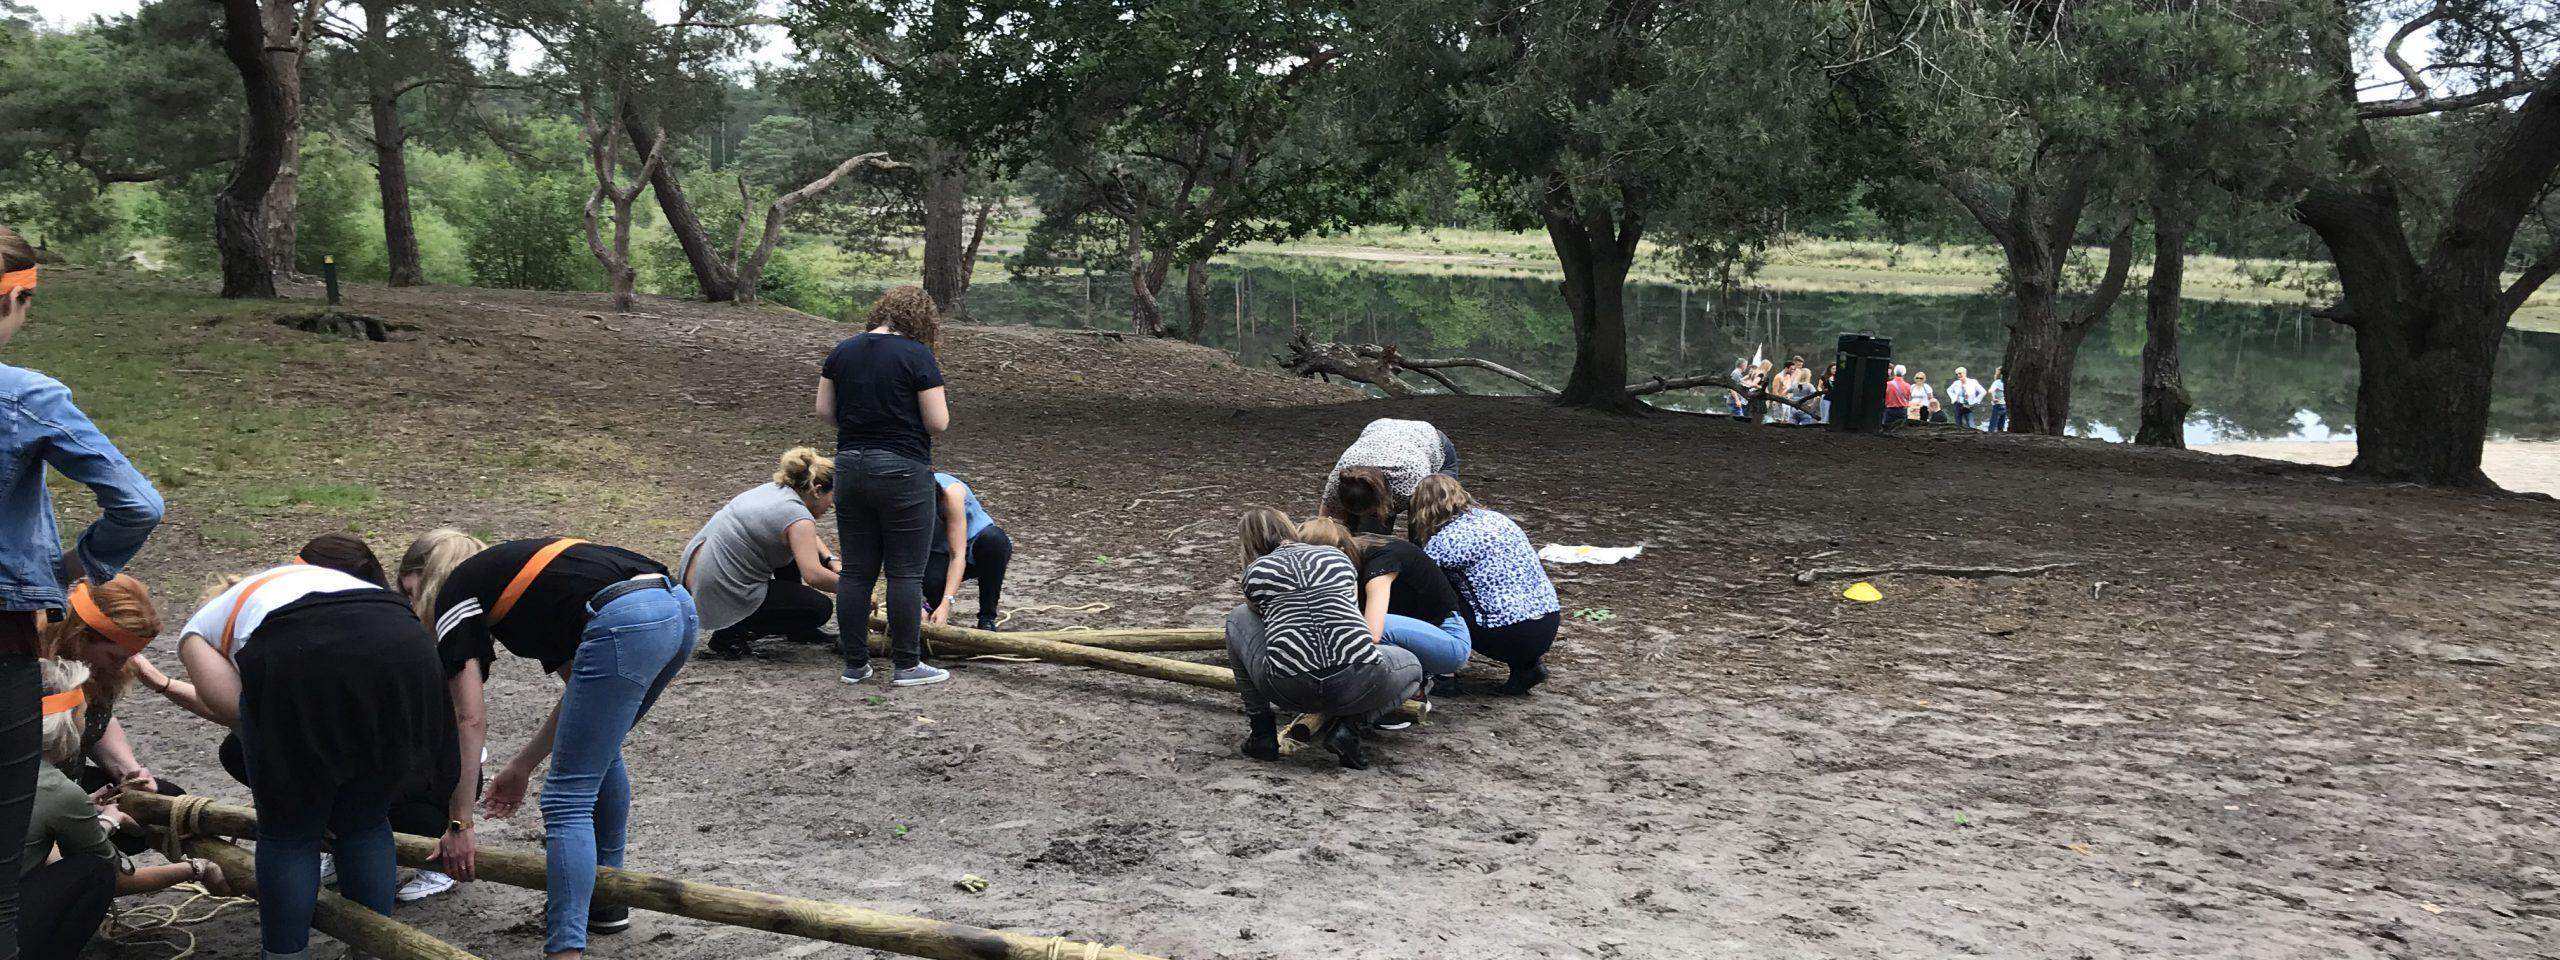 teambuilding-eindhoven-teamchallenge